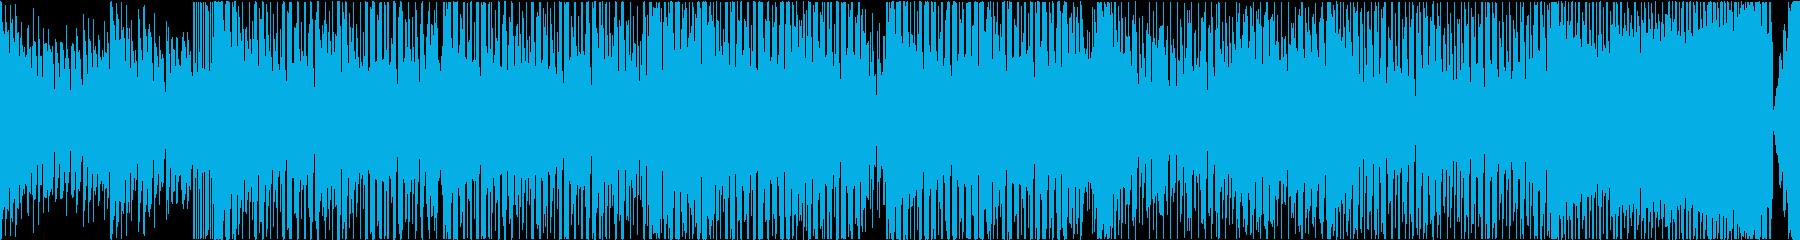 EDM ピアノ スポーツ バラエティLPの再生済みの波形